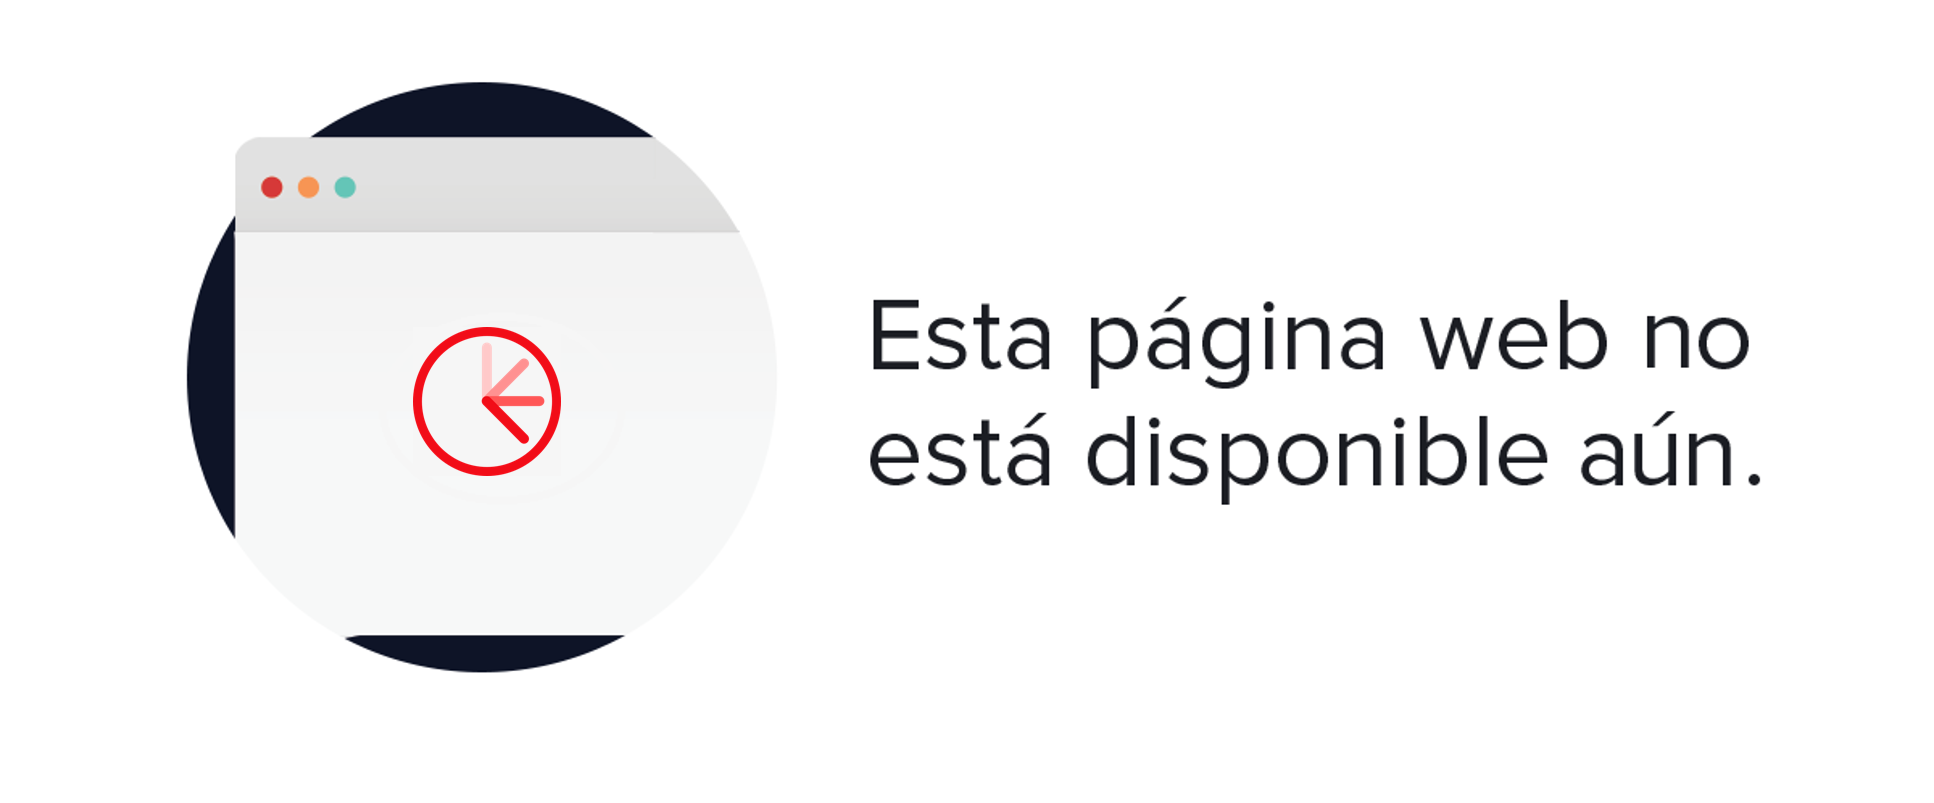 OXXO - Pantalón de mujer OXXO jaspeado con franjas laterales Rojo 8681613108097 - RIBAMWL